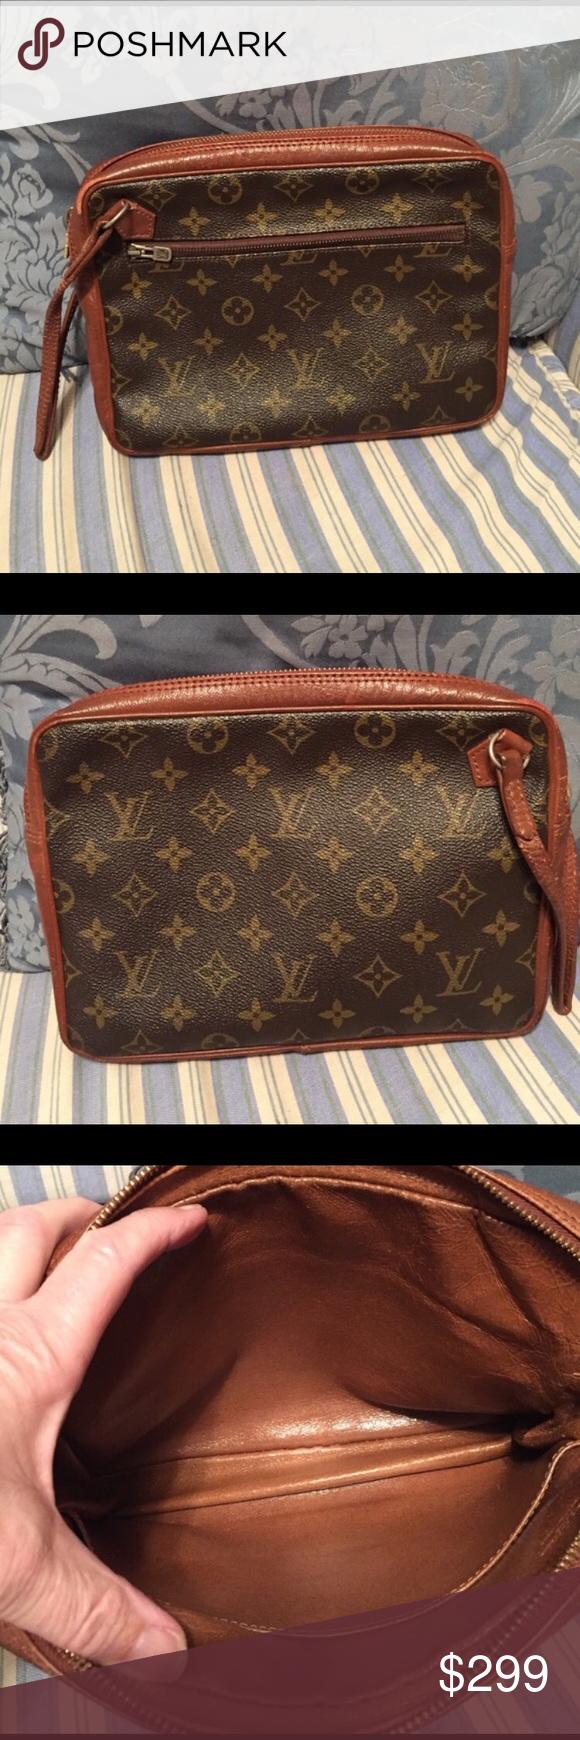 ❤Vintage Louis Vuitton Clutch Vintage clutch with wrist strap